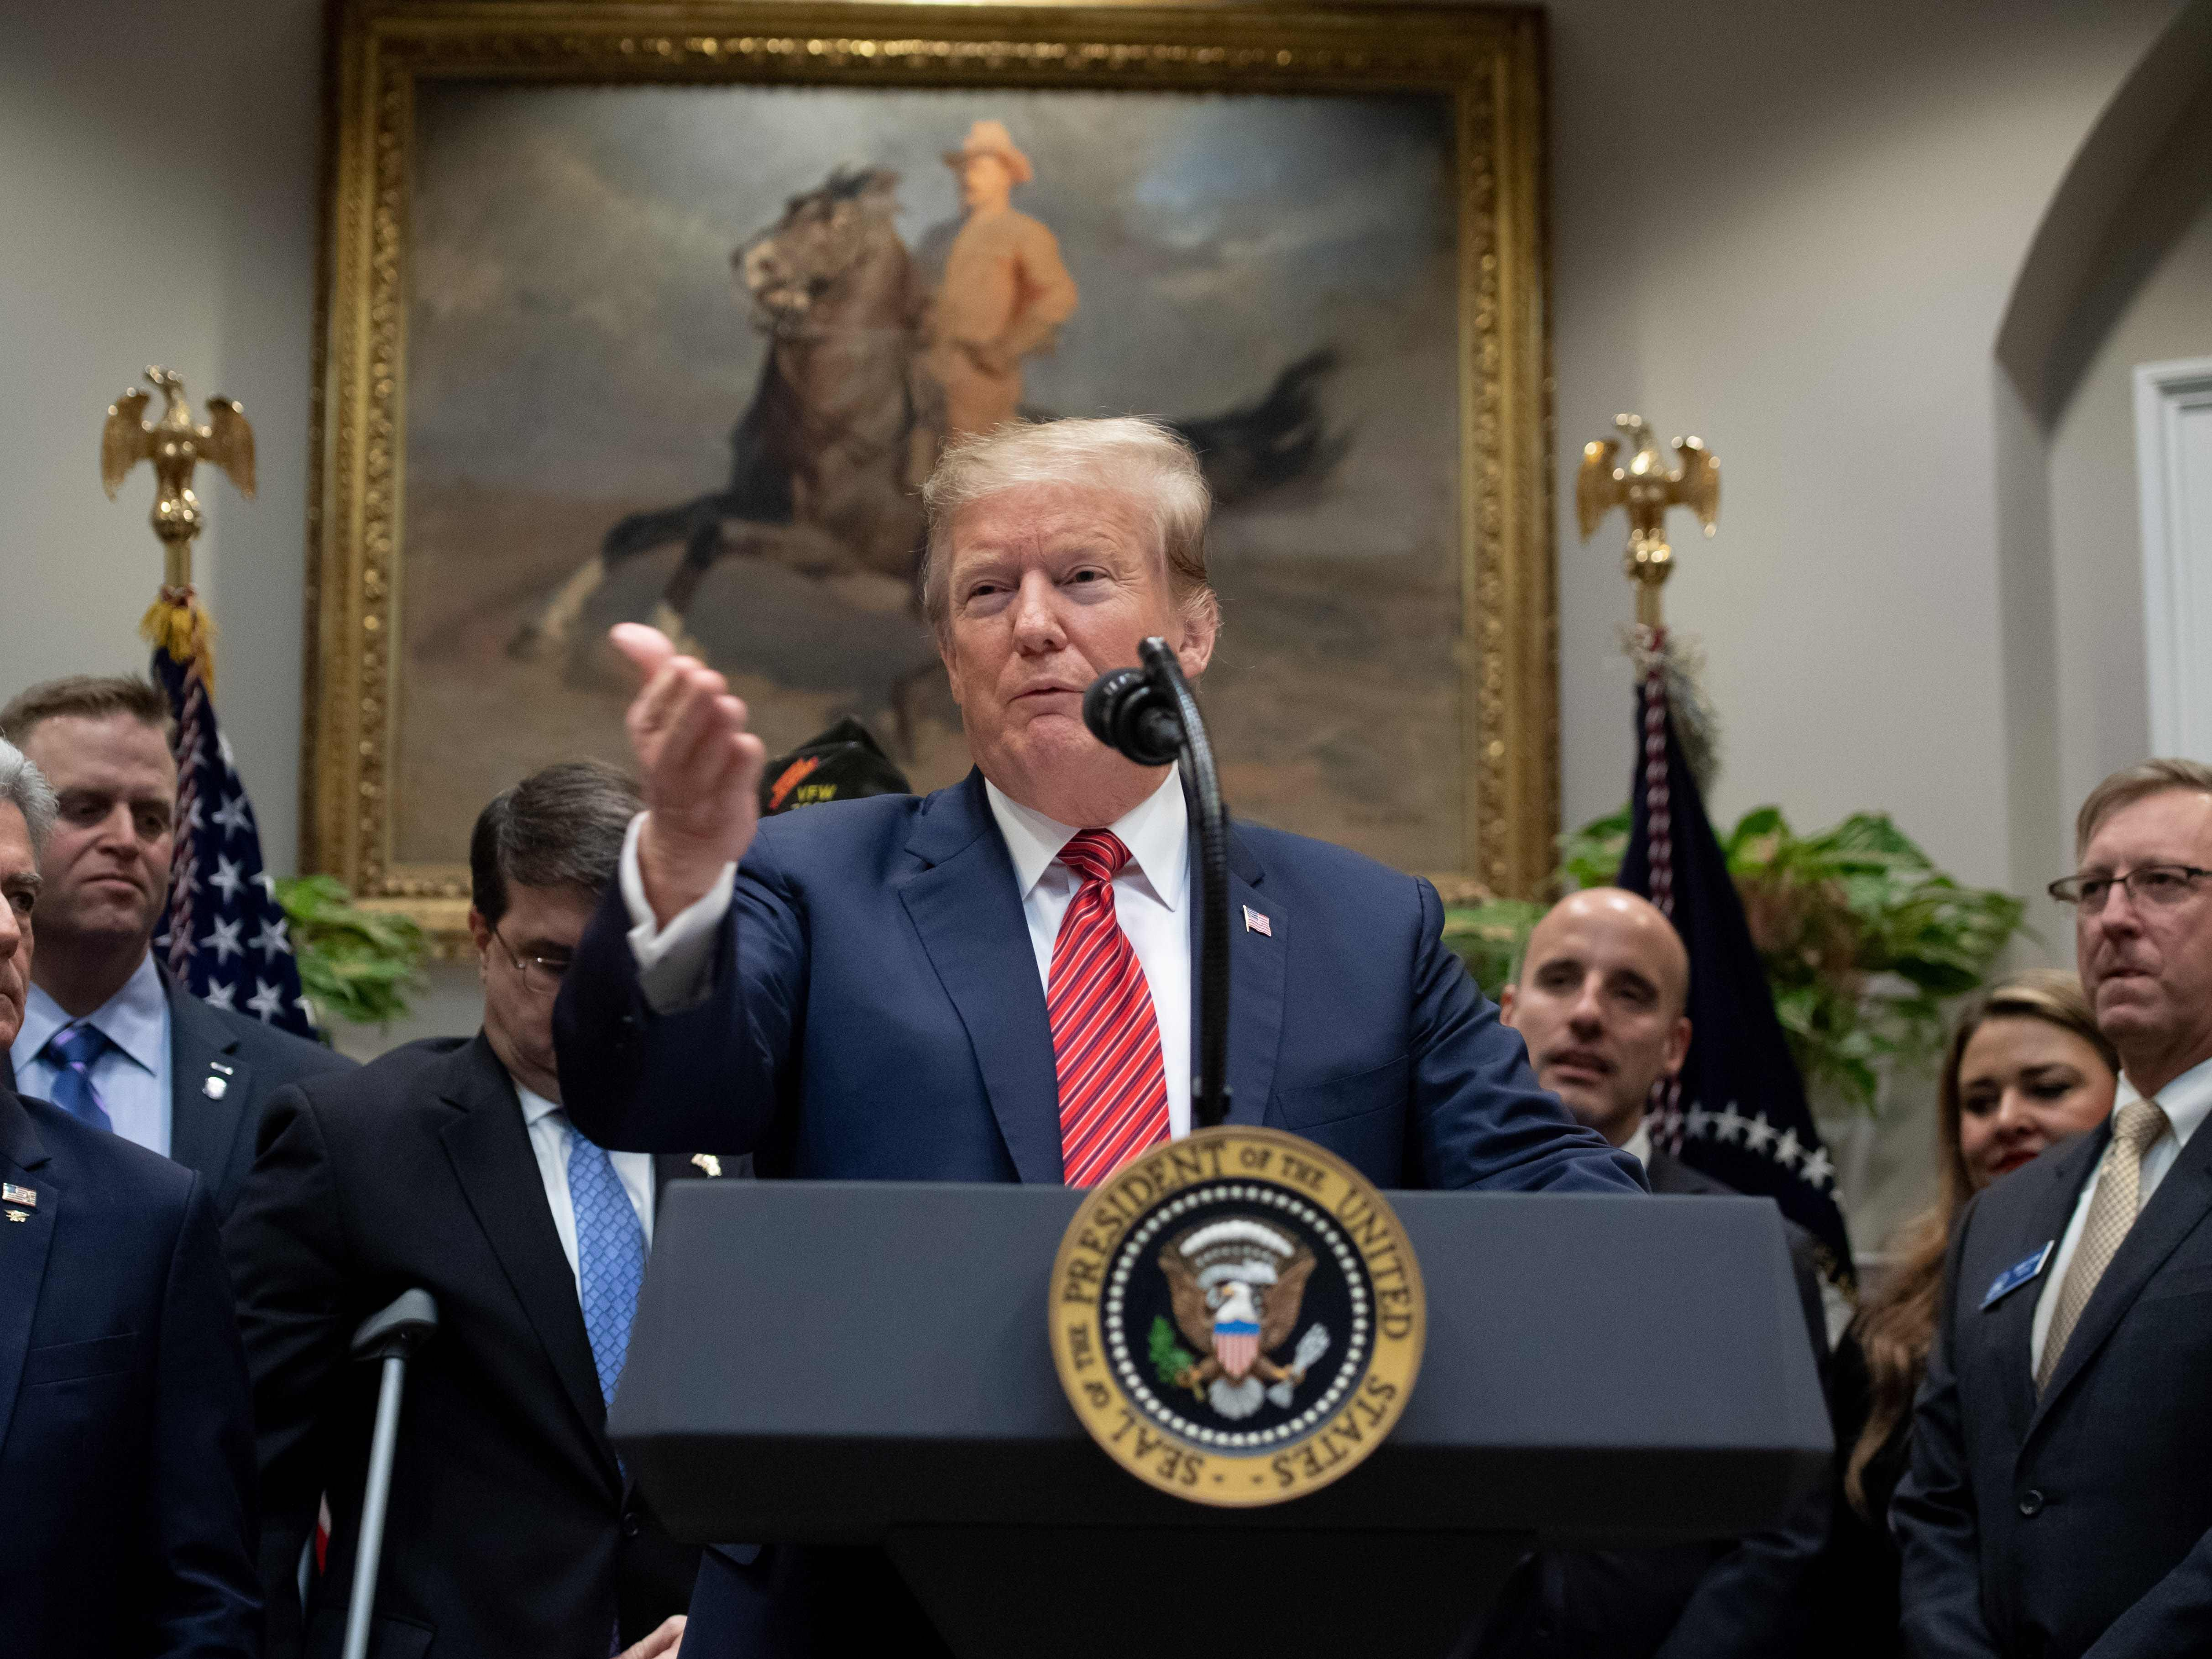 Peter Navarro: President Trump's trade policies make great strides